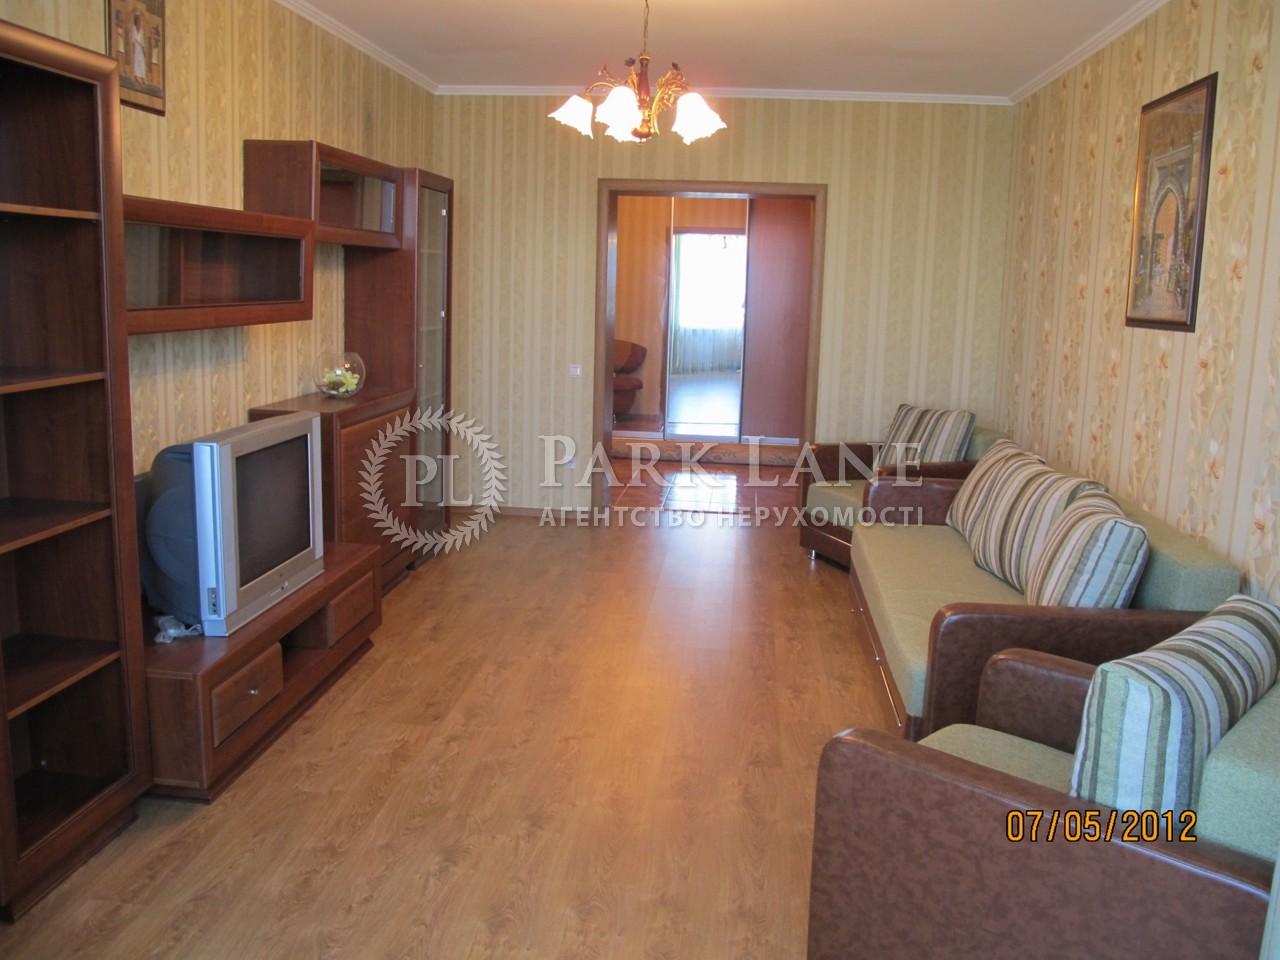 Квартира вул. Хмельницька, 10, Київ, Z-981546 - Фото 5